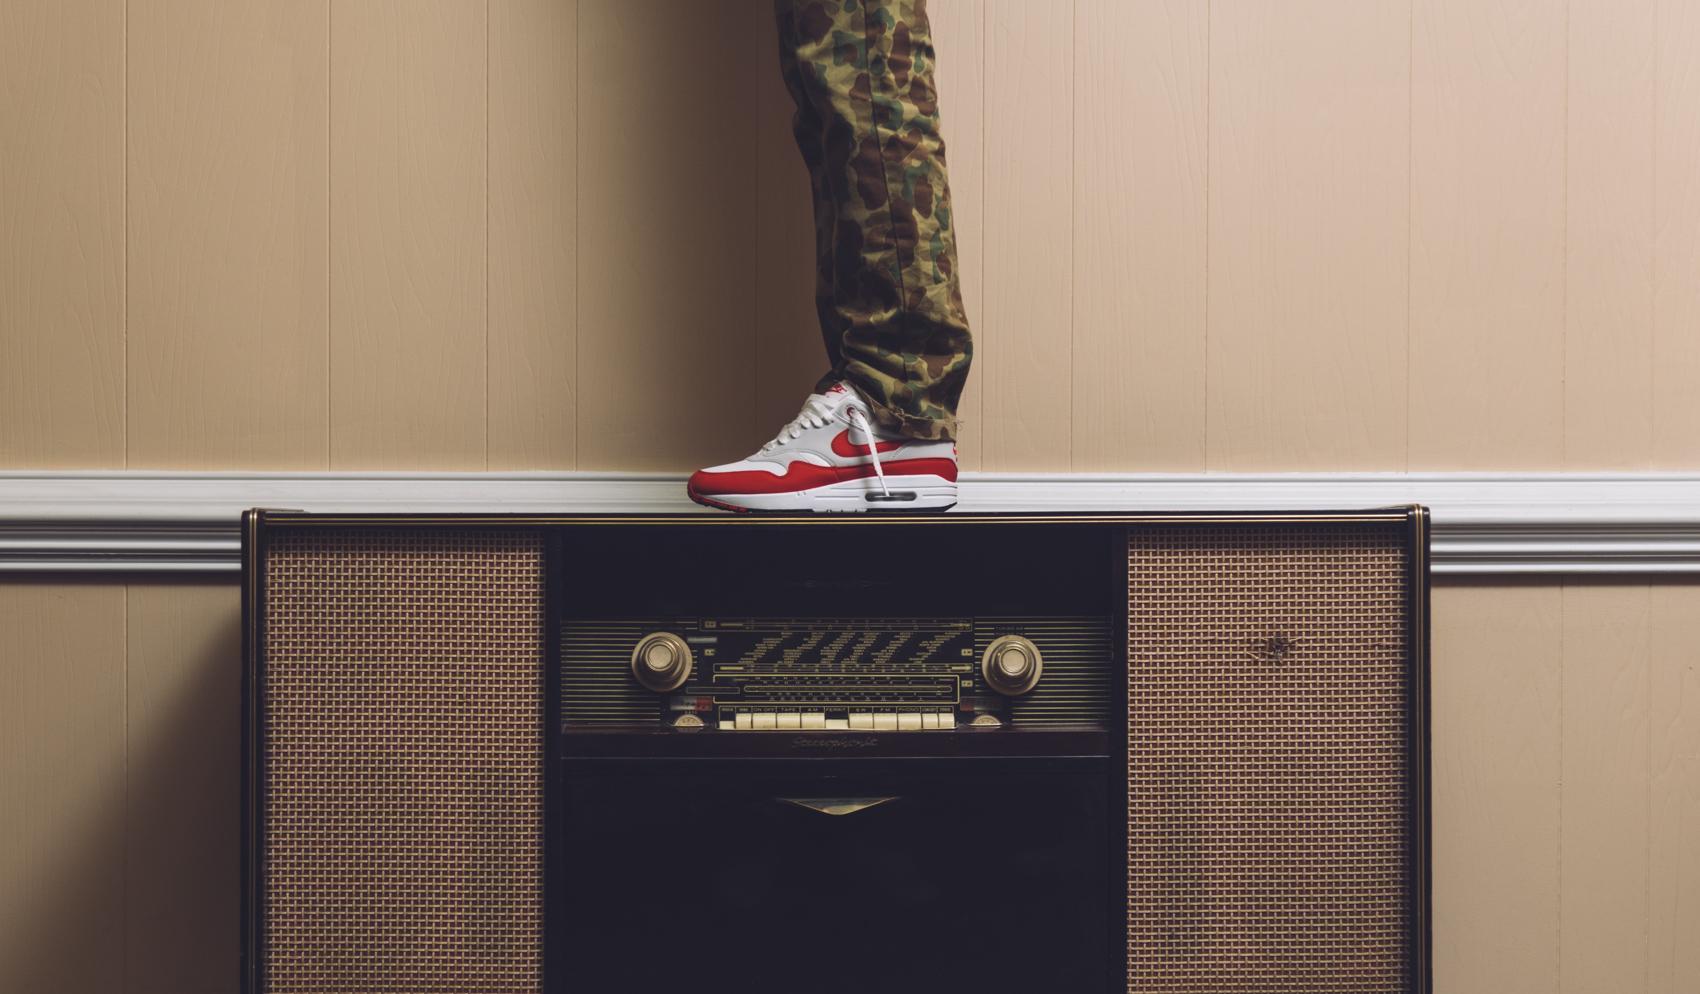 The Nike Air Max 1 OG Anniversary Arrives Next Week Here's